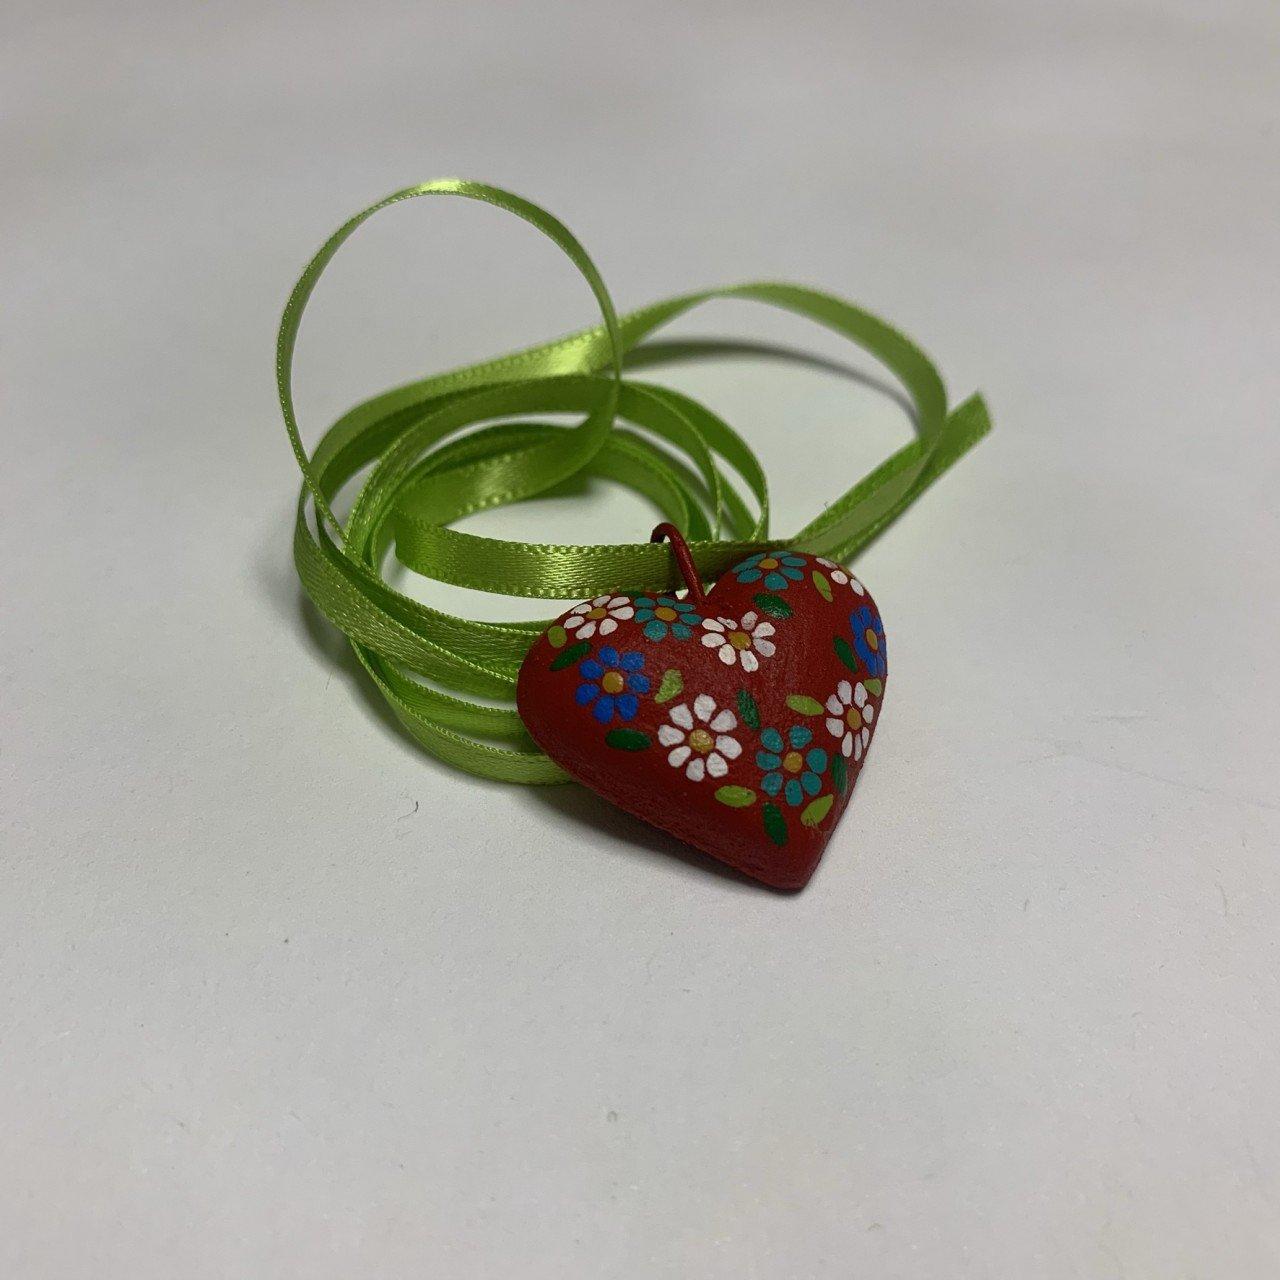 Corazón de barro artesanal (collar)